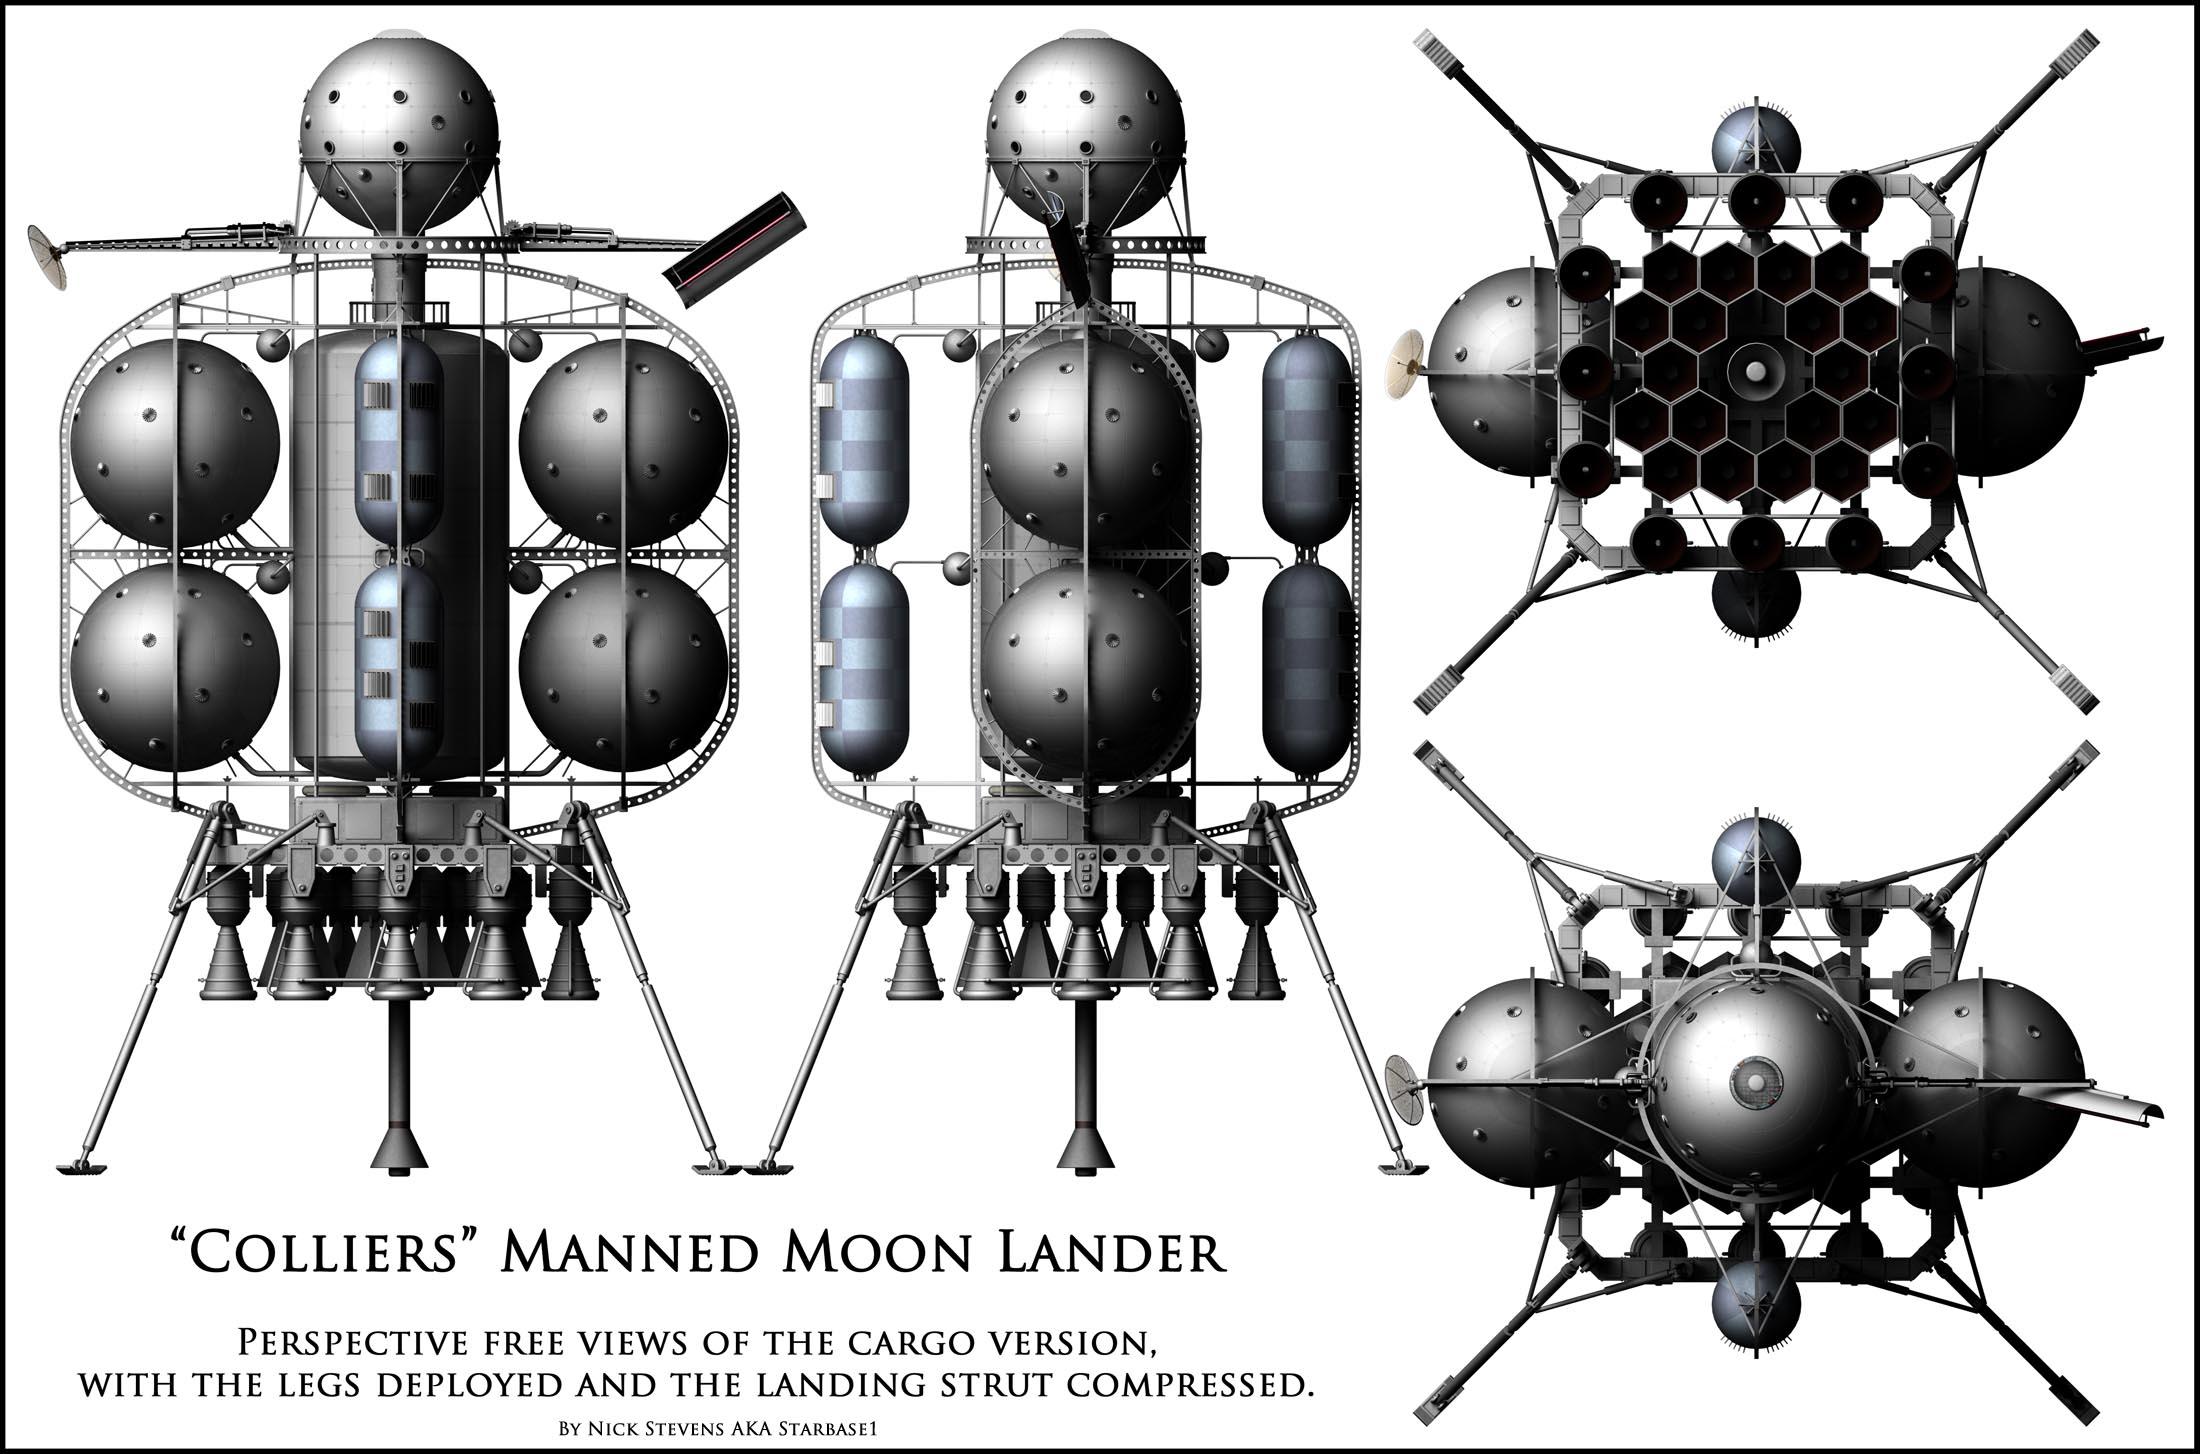 colliers-moon-lander-cargo